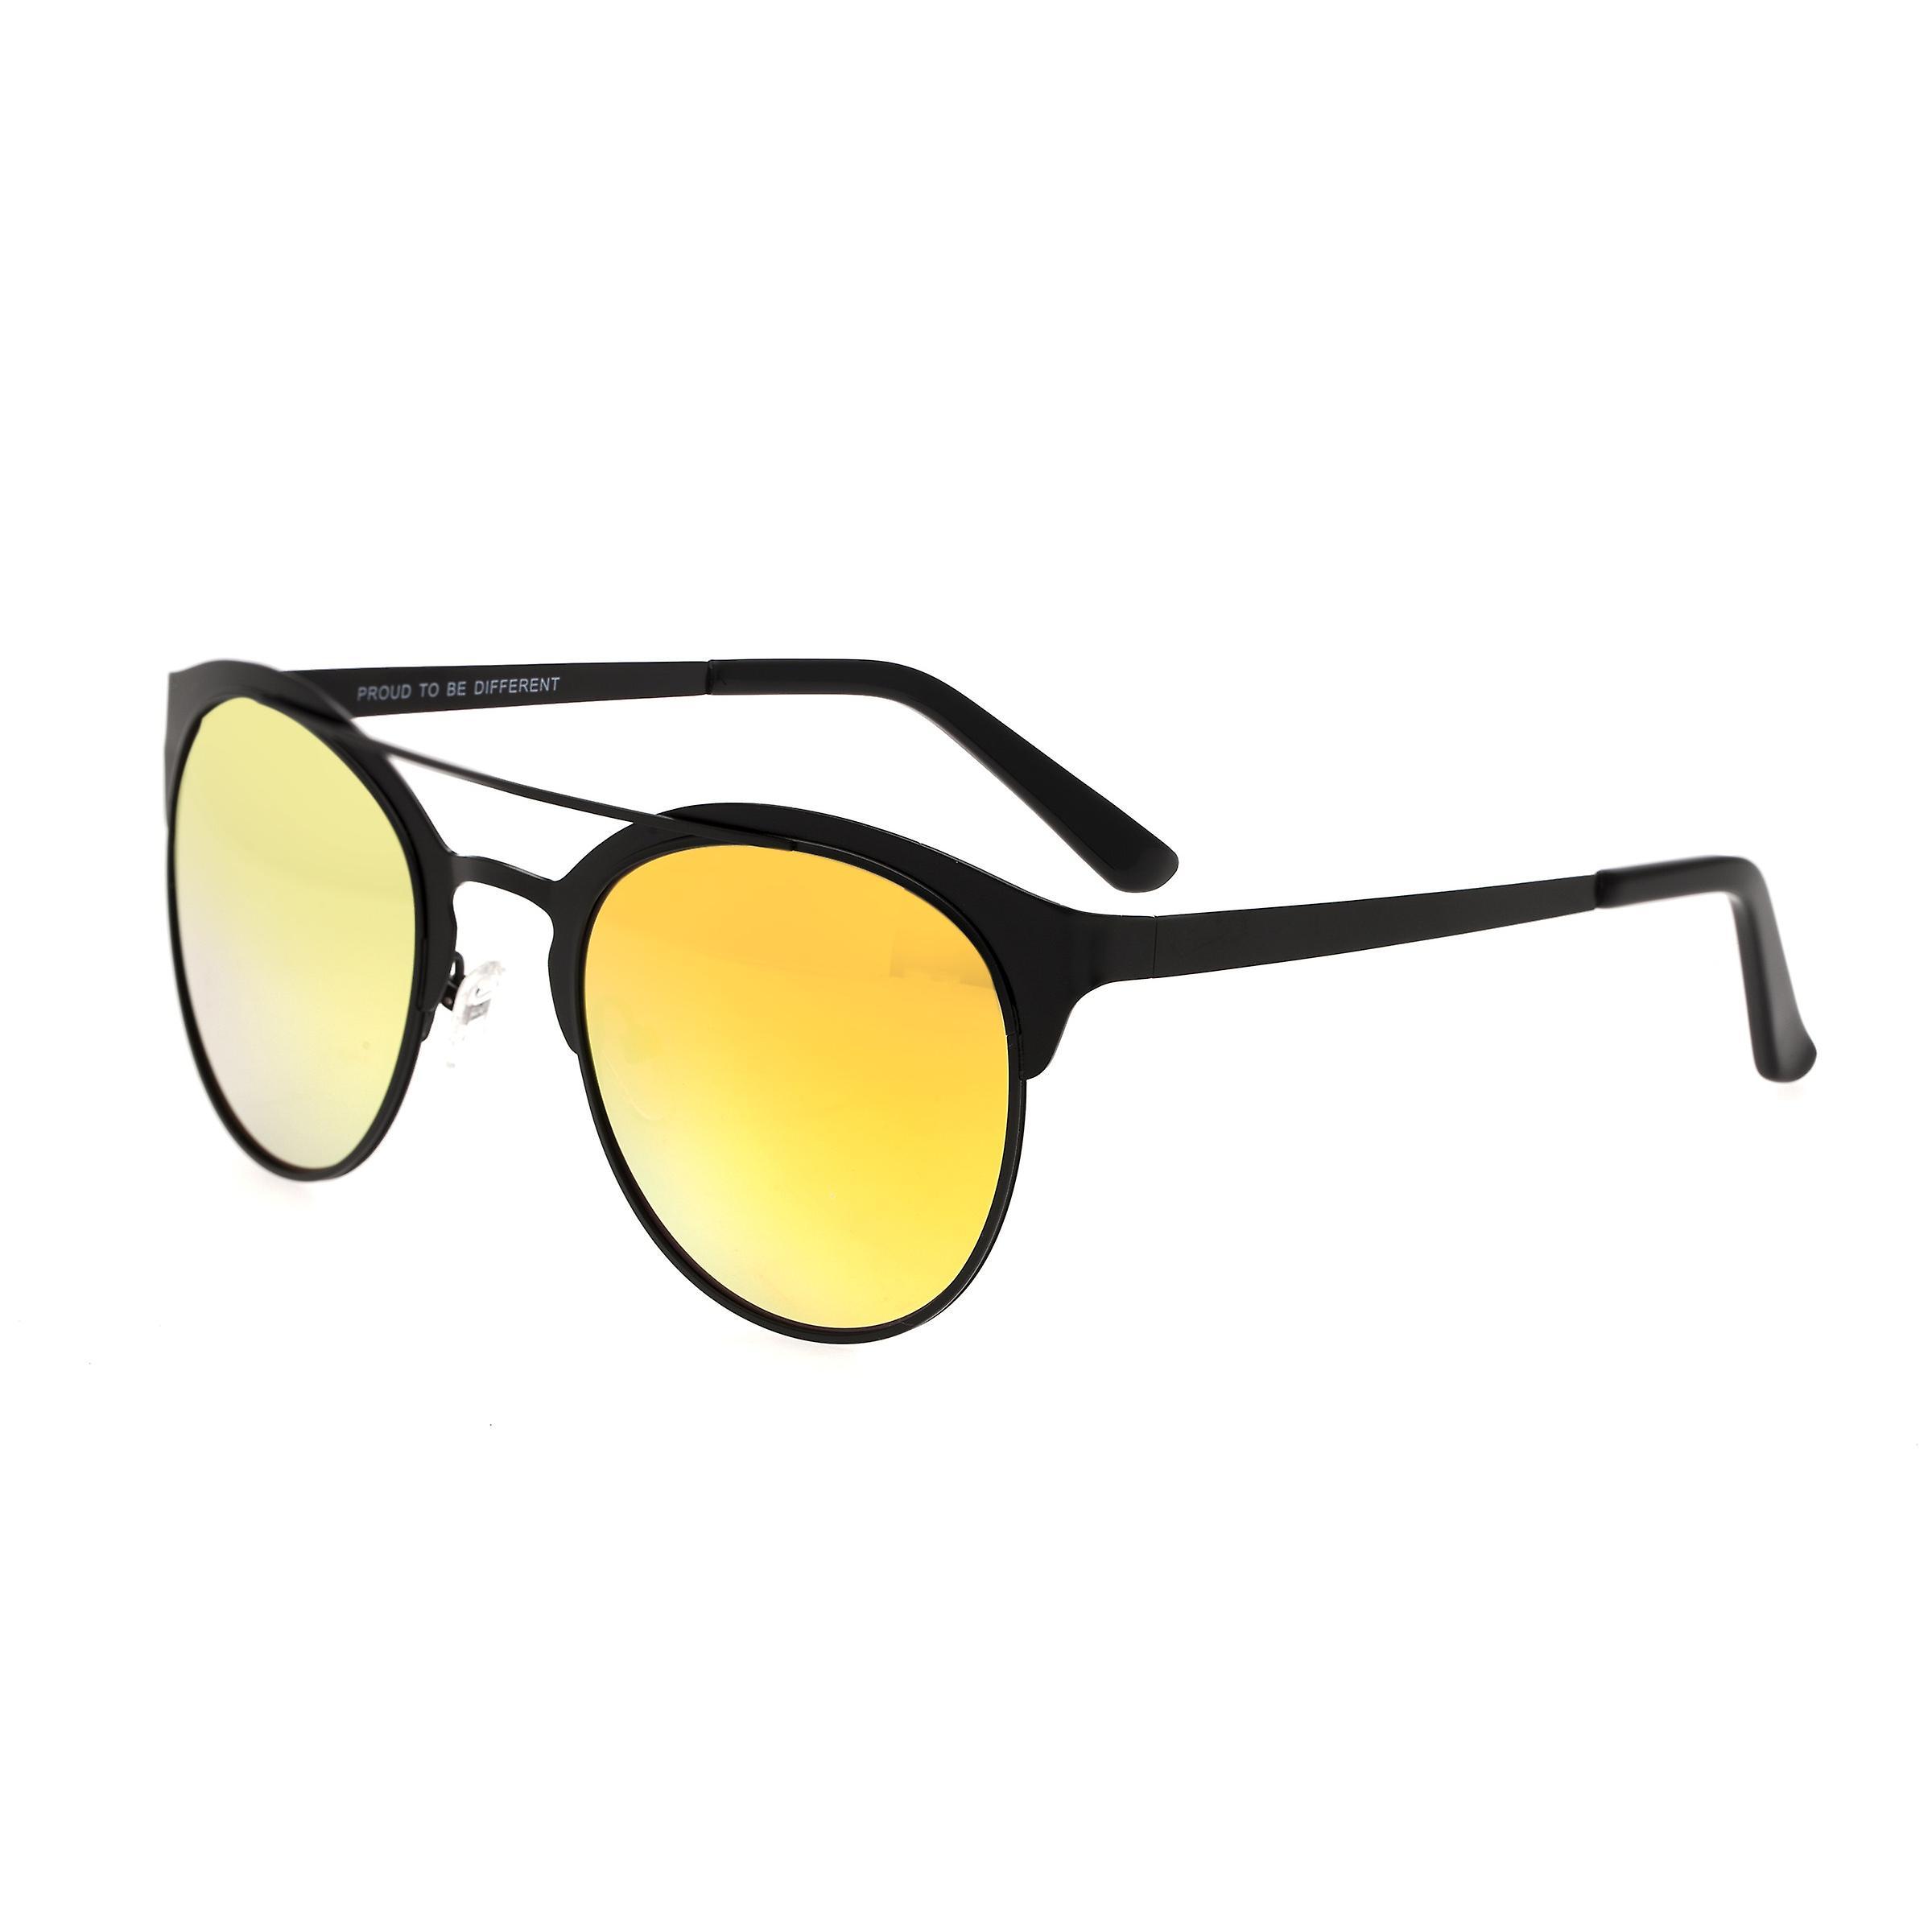 Breed Phoenix Titanium Polarized Sunglasses - noir jaune